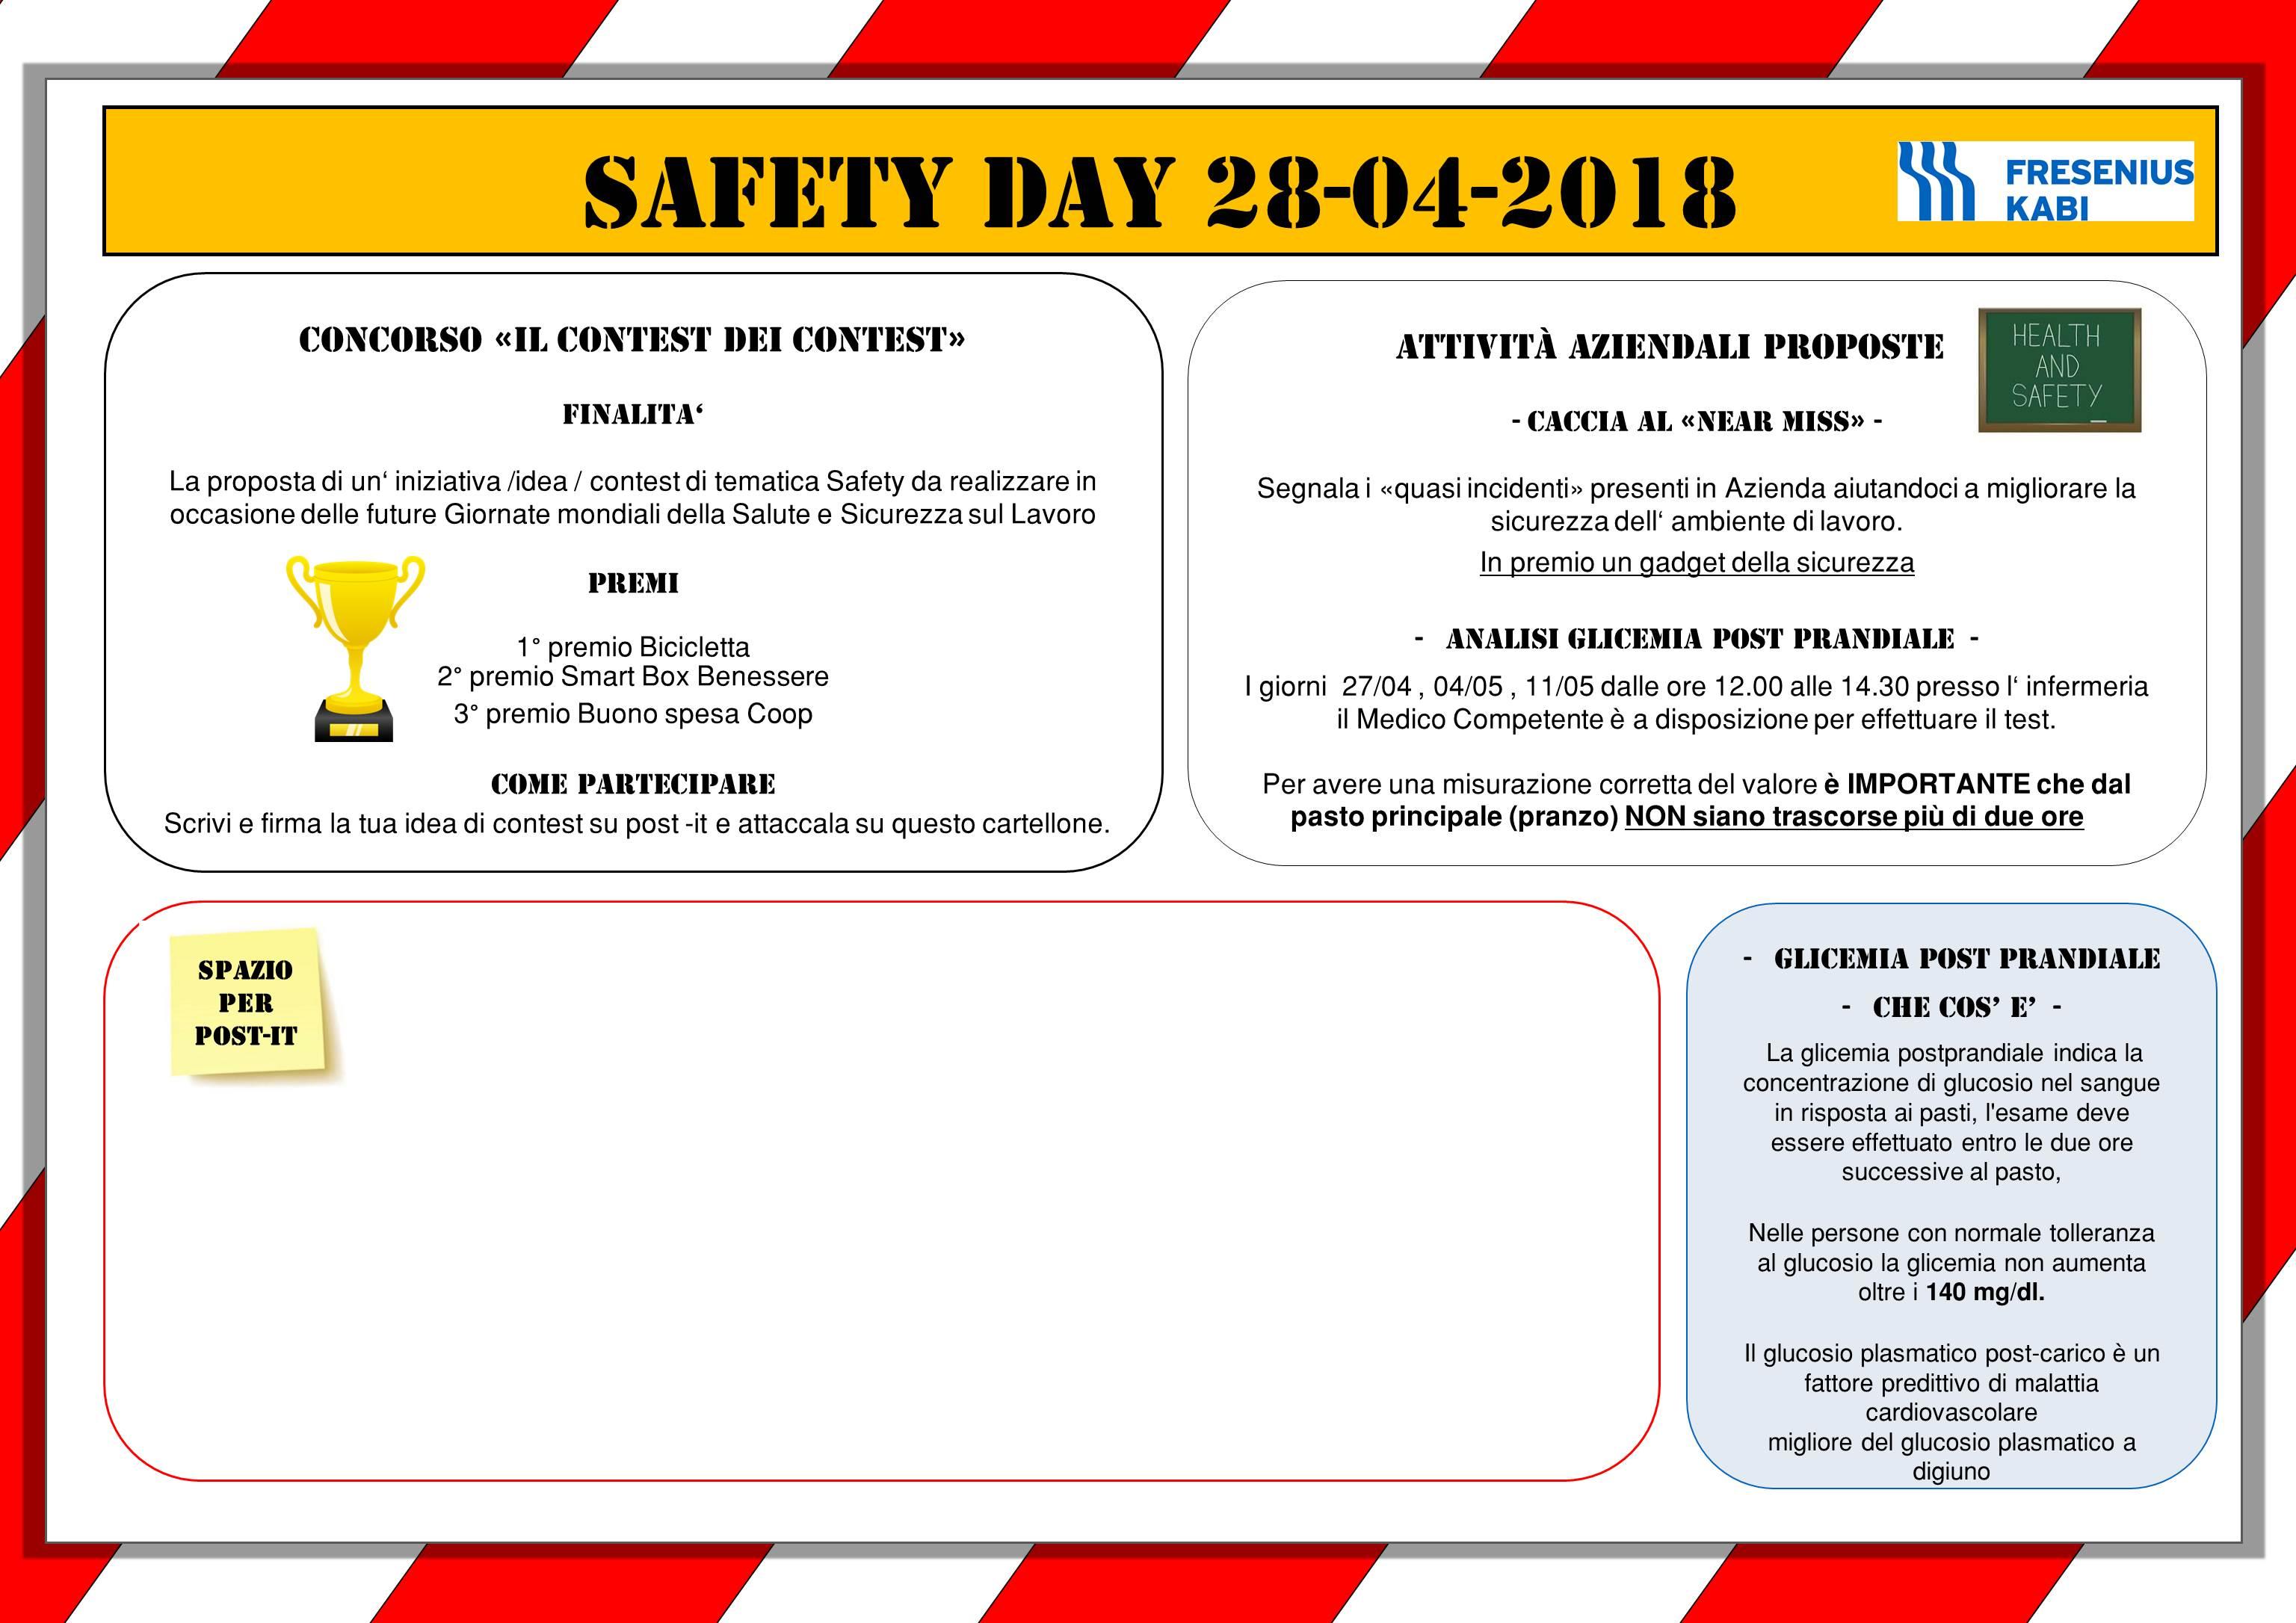 http://www.fondlhs.org/wp-content/uploads/2018/04/Cartellone-Safety-DayREV01.jpg